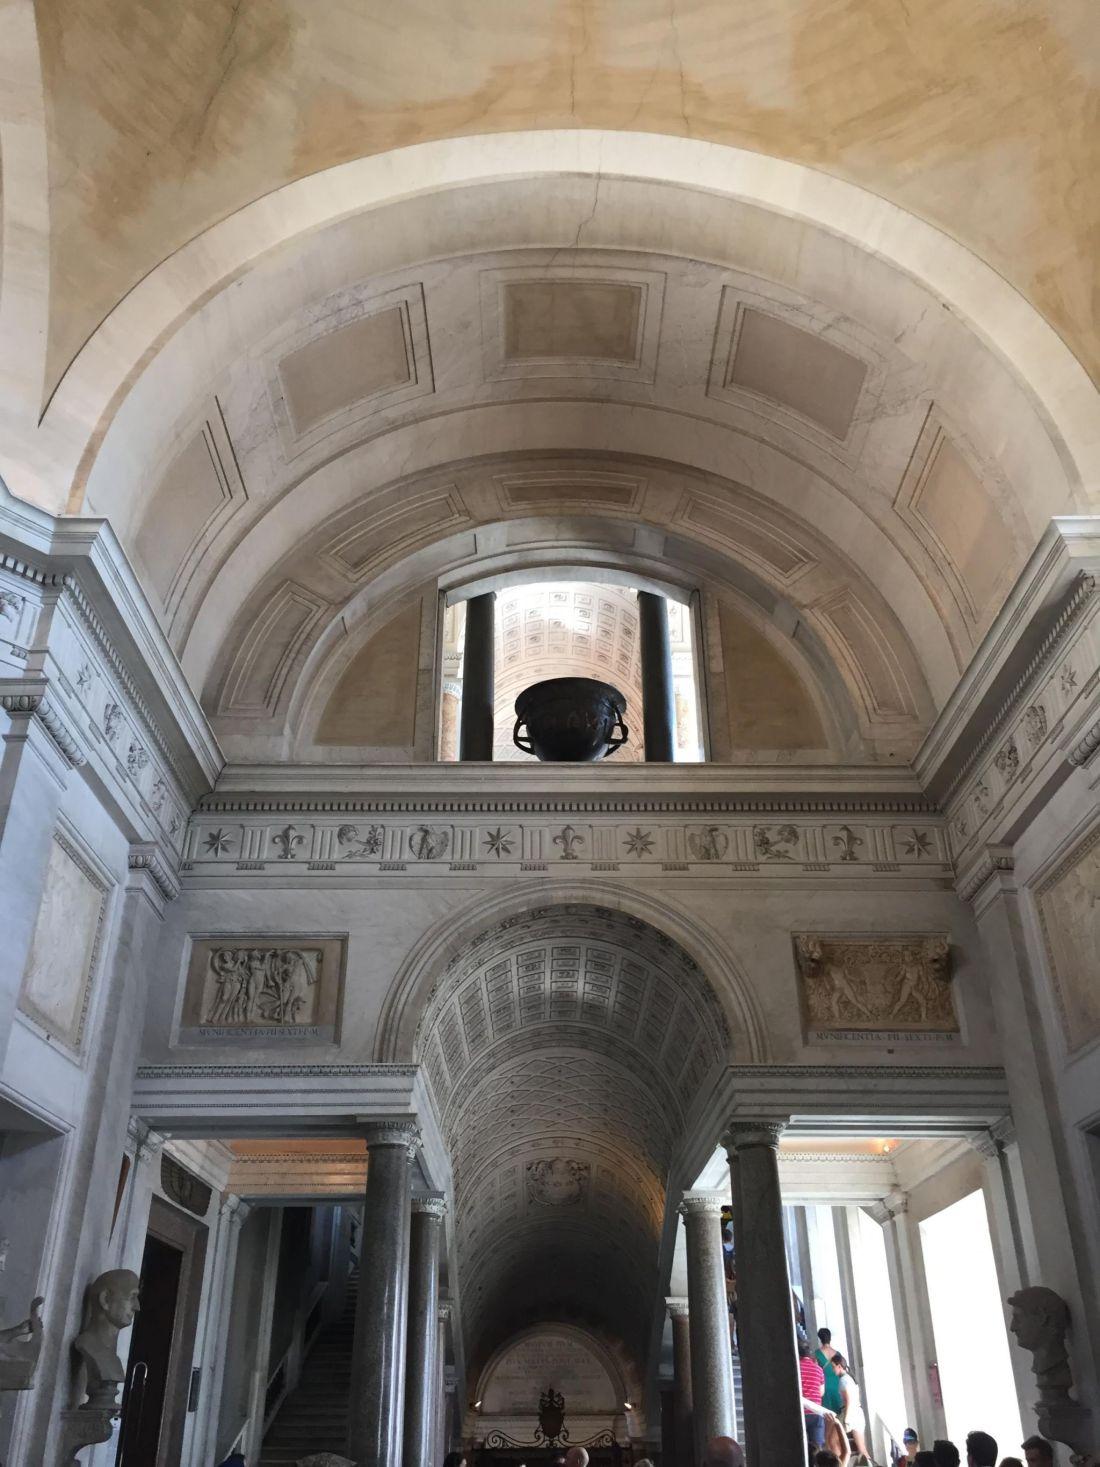 Ceilings of the Vatican Museum